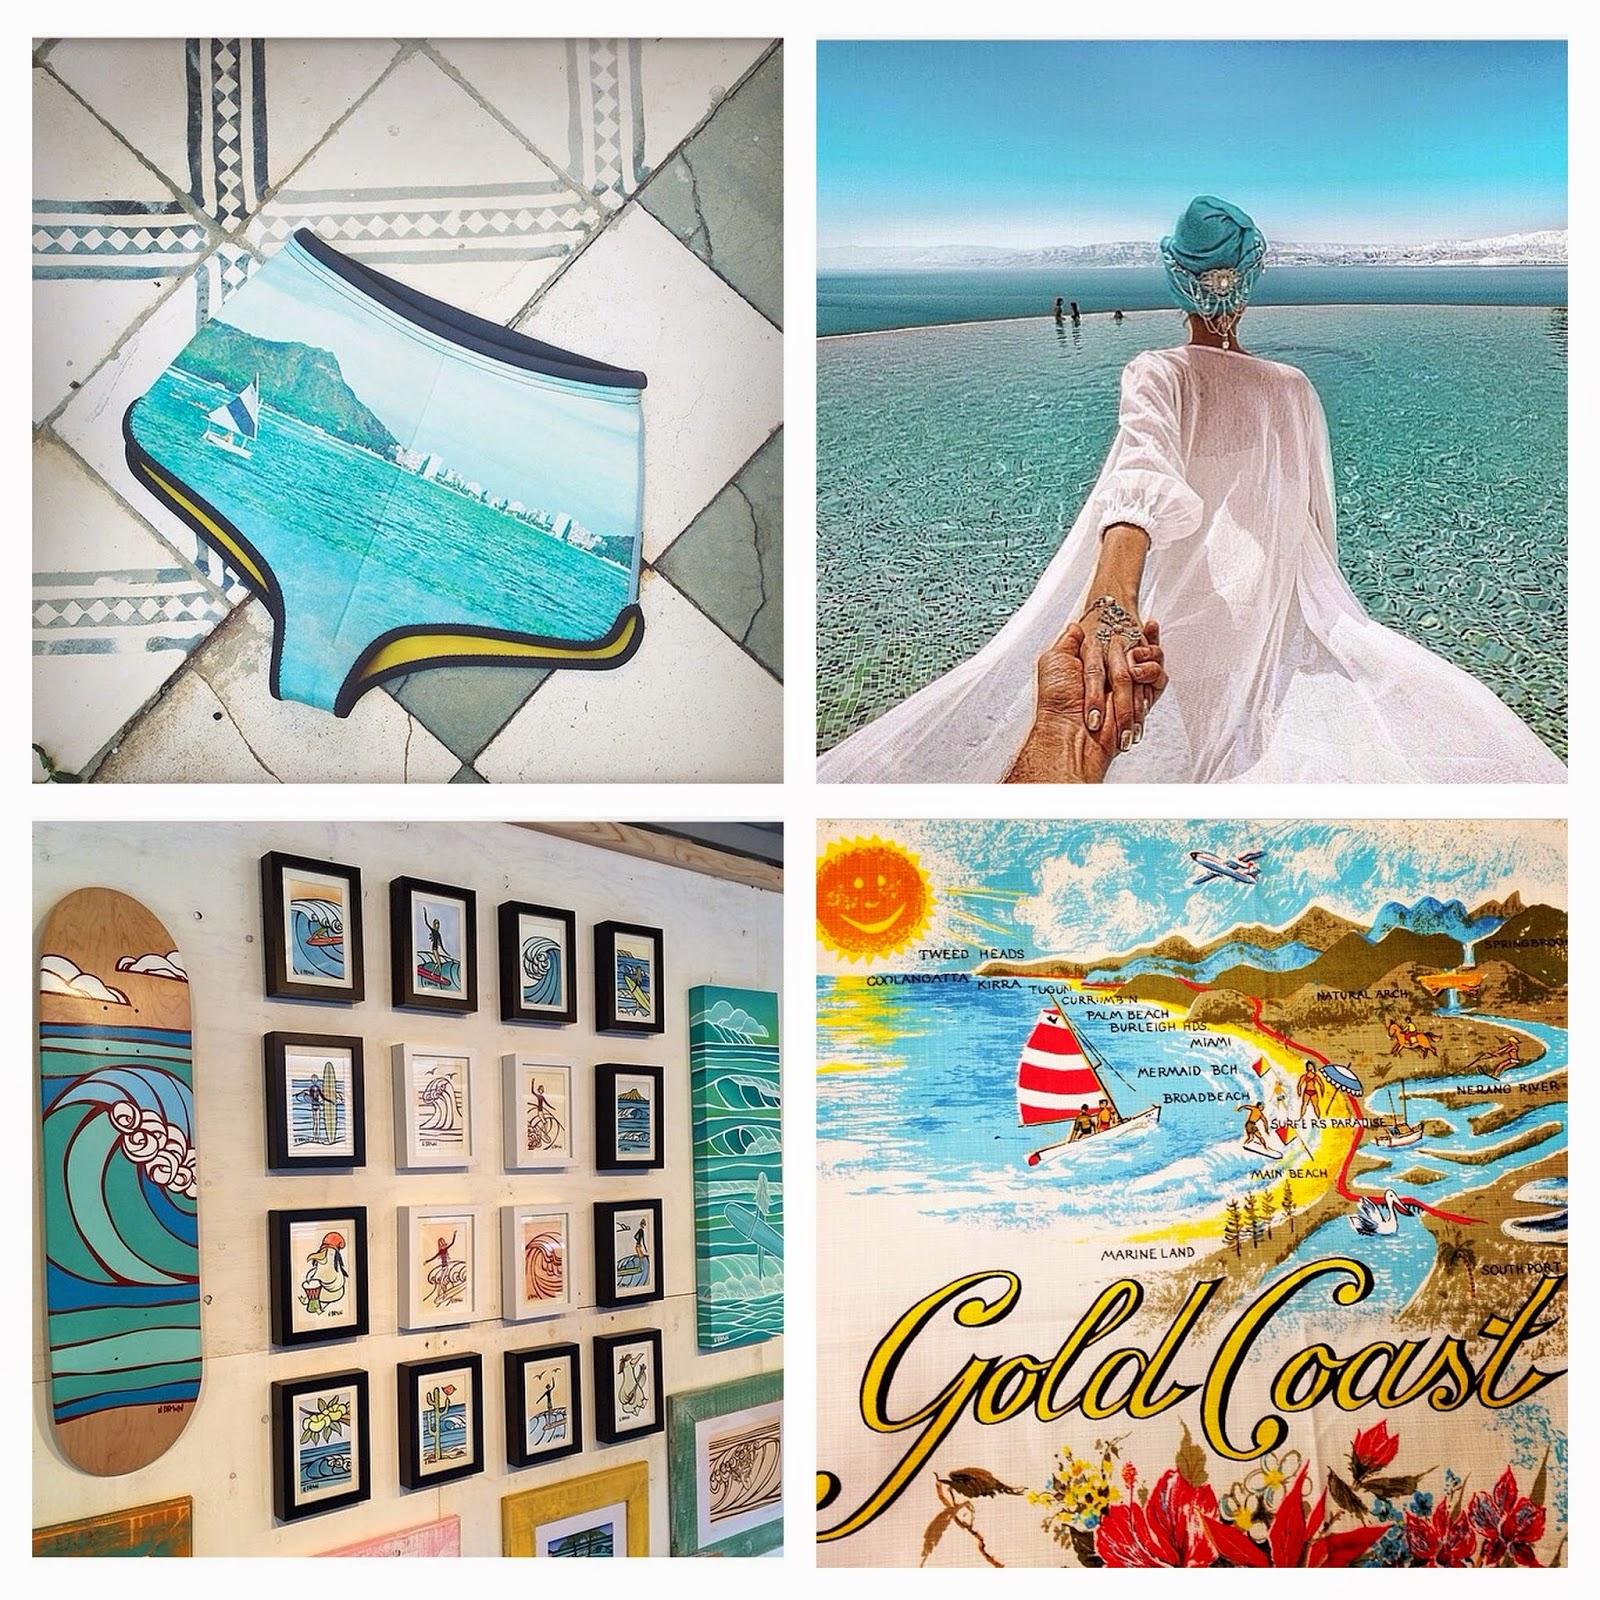 instagram,instalove,instasipration,the mood,hippie beach